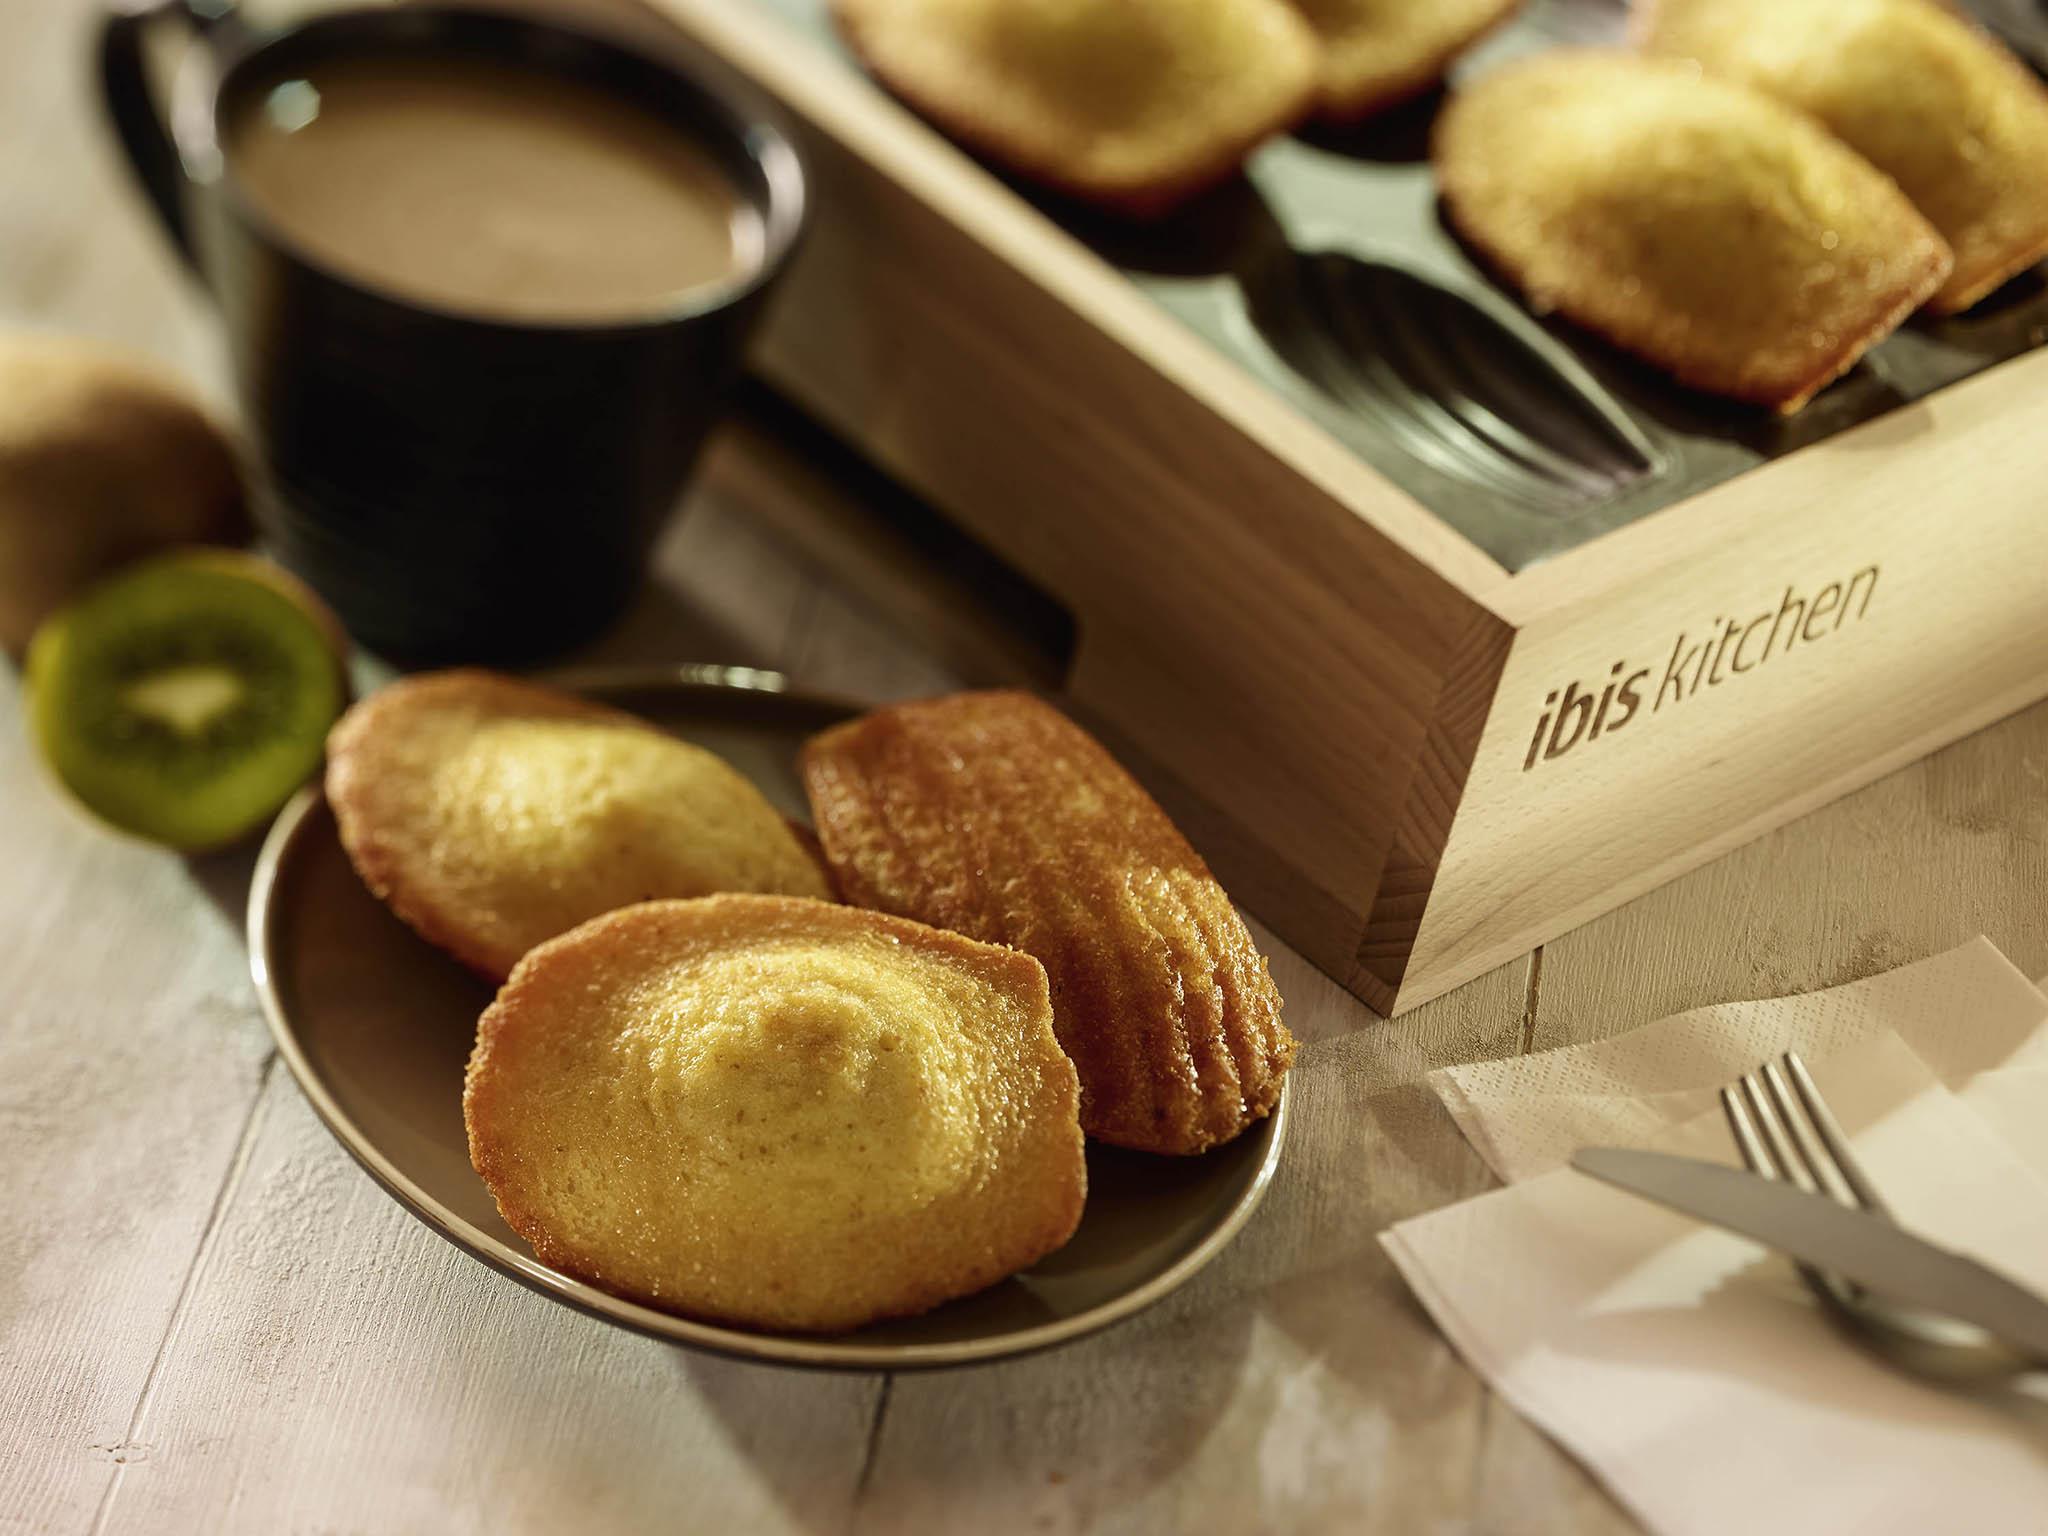 Hotel In Toulouse Ibis Universit The Little Things She Needs Kashira 2b Brown Cokelat 38 Breakfast